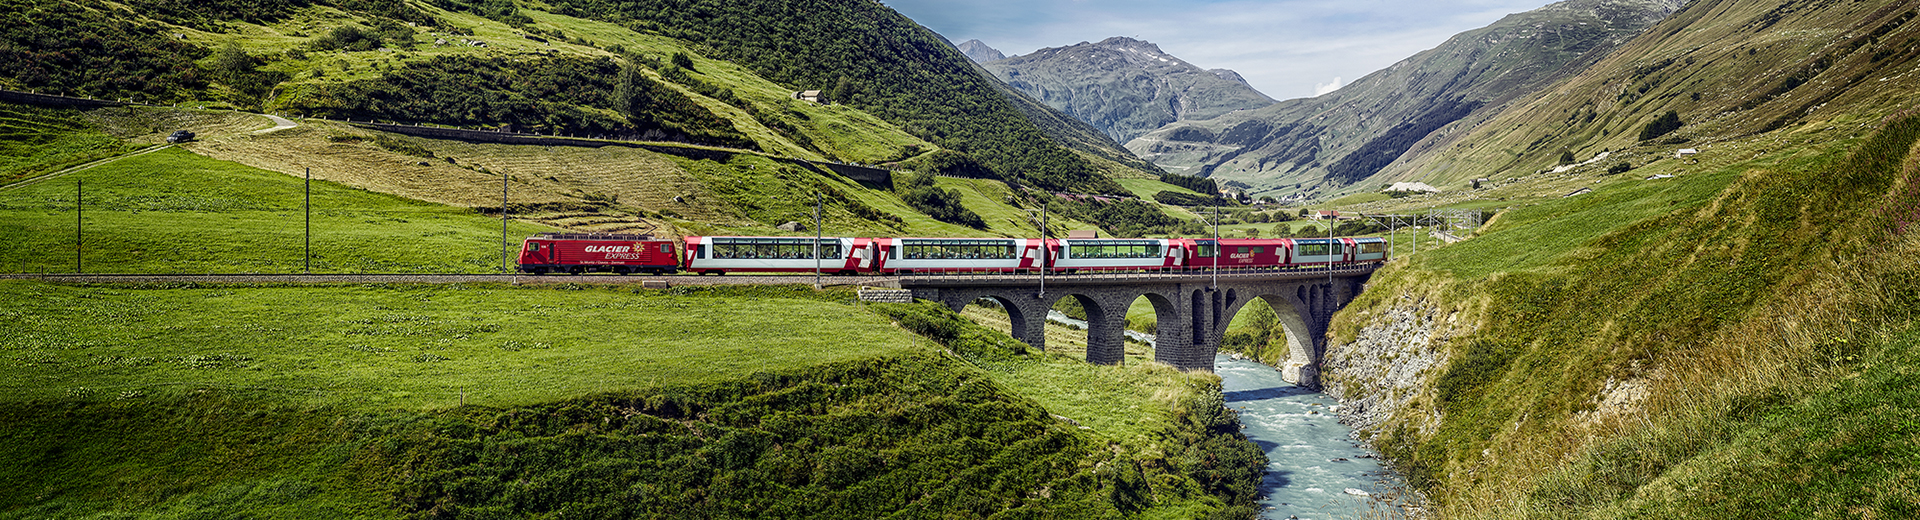 Glacier Express (Chur - Zermatt, CH)